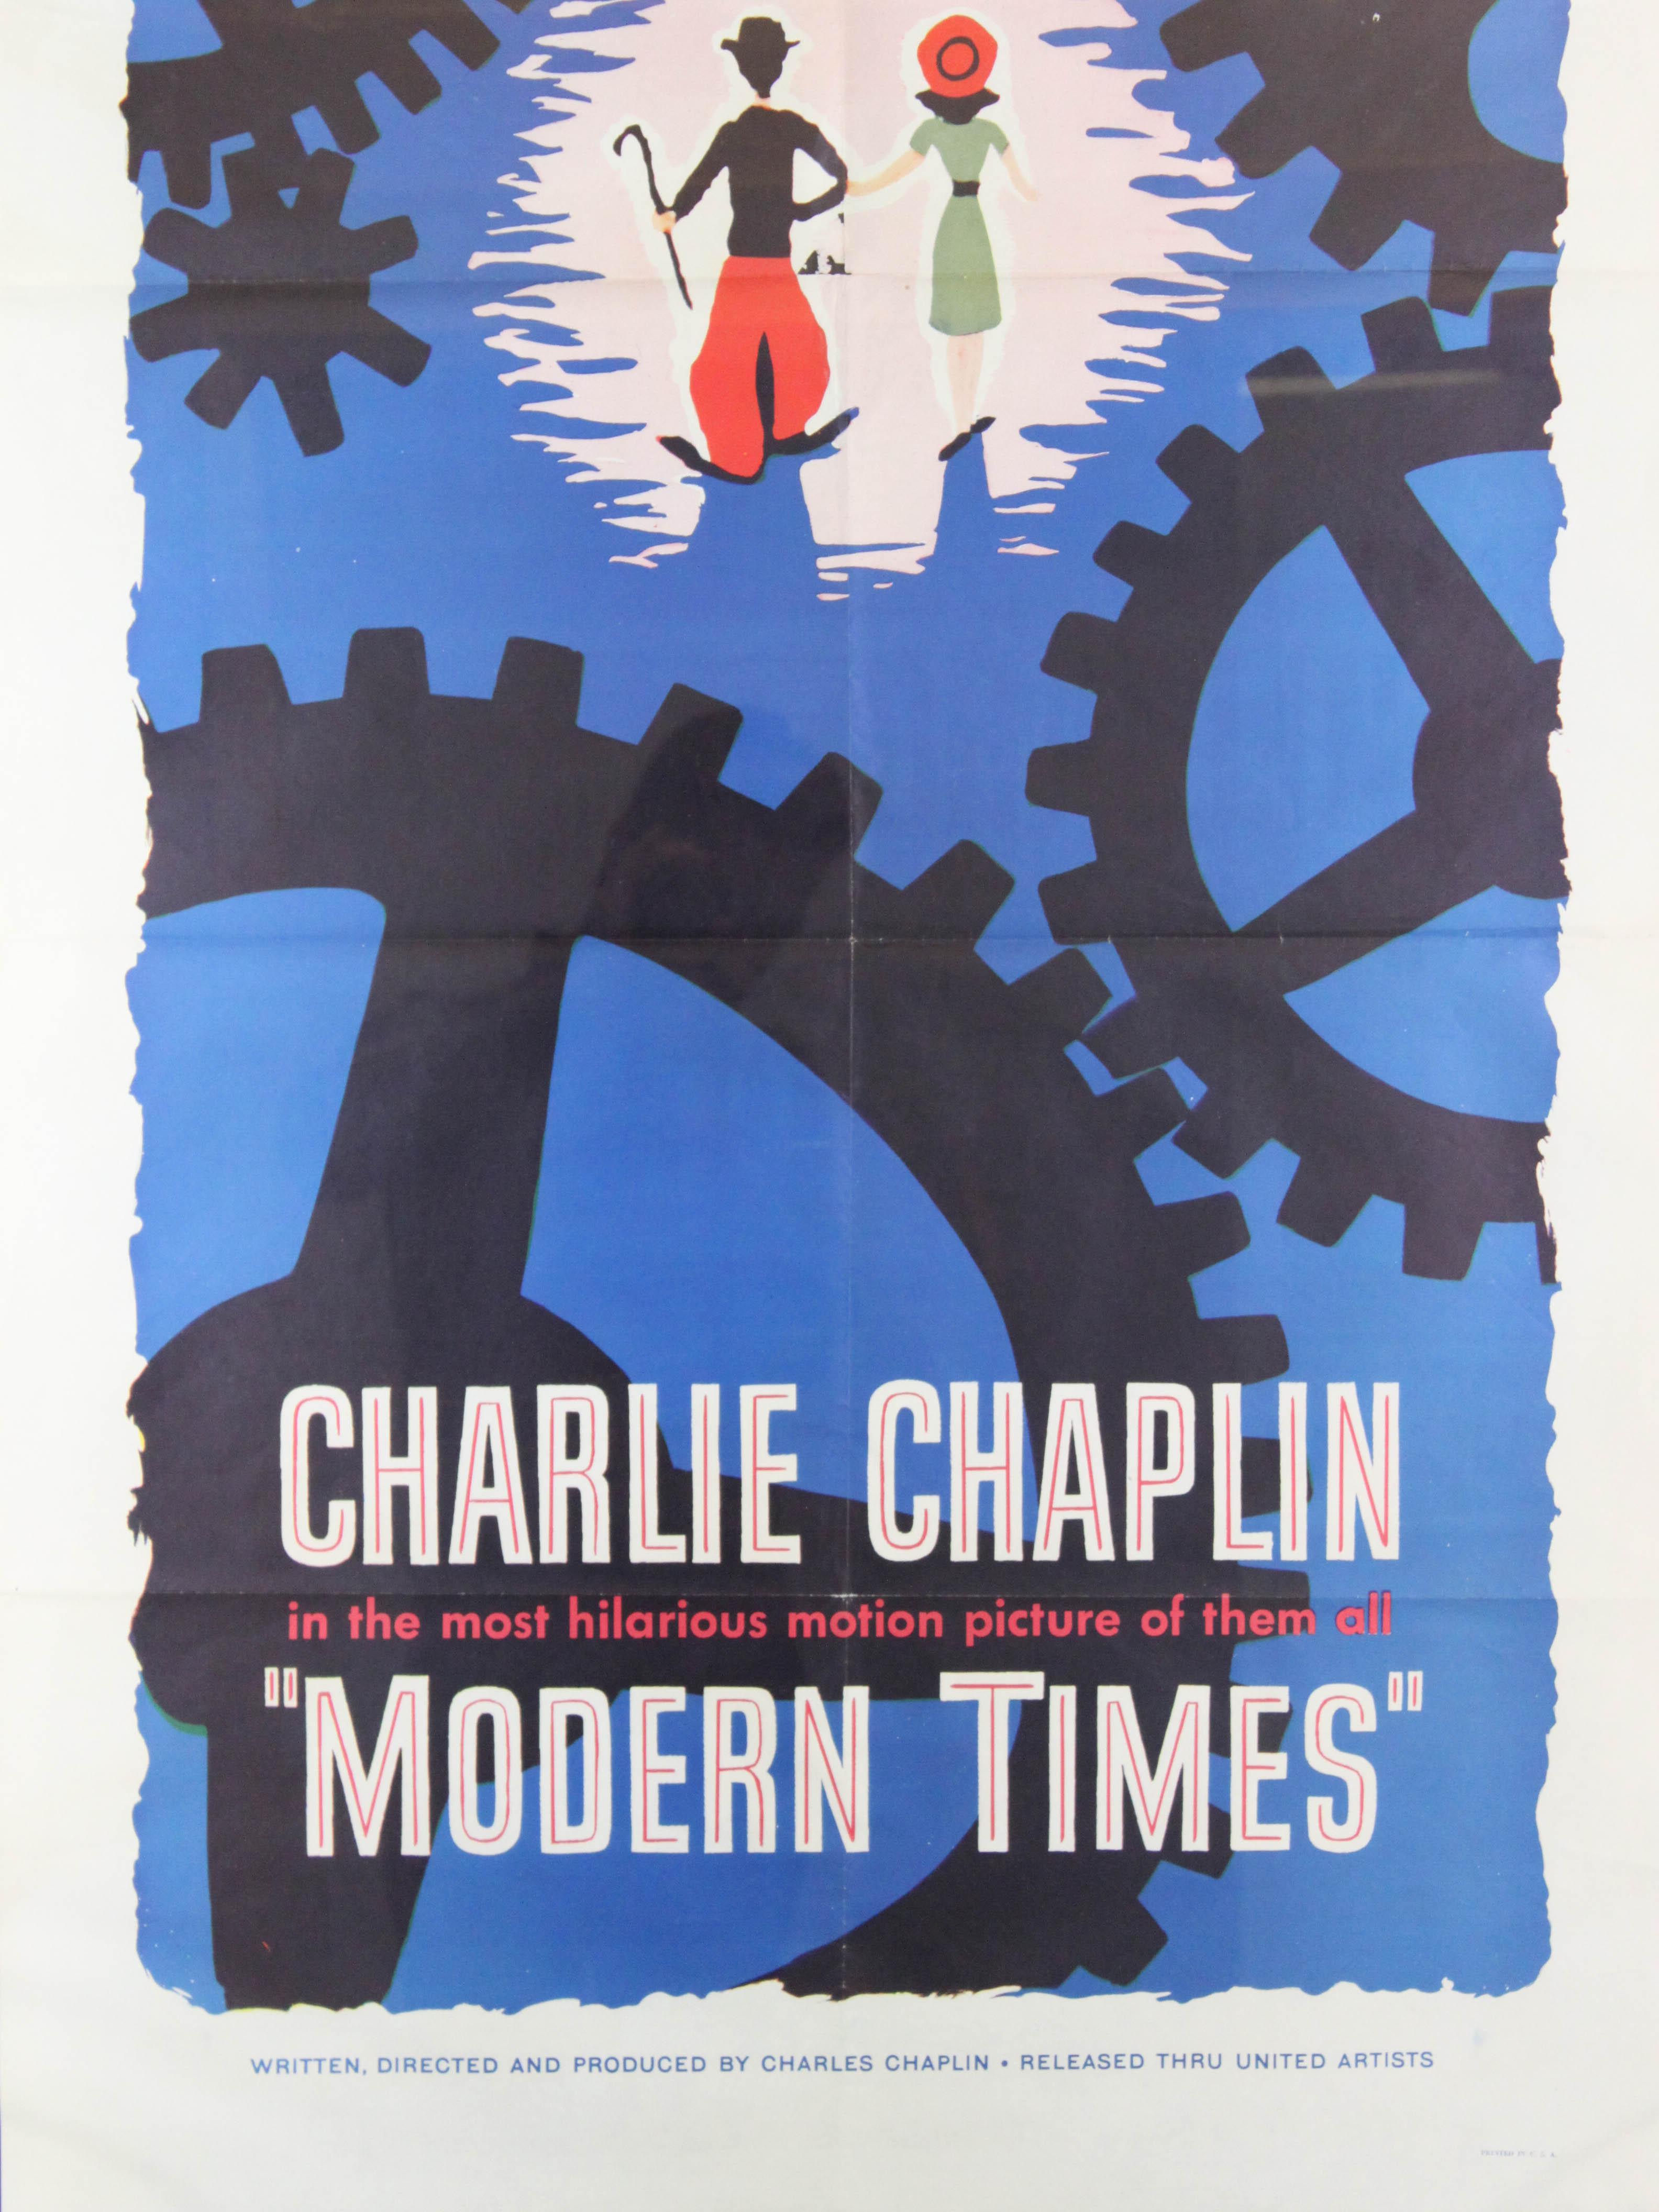 Charlie-Chaplin-Modern-Times-Movie-Poster-WA1015-2